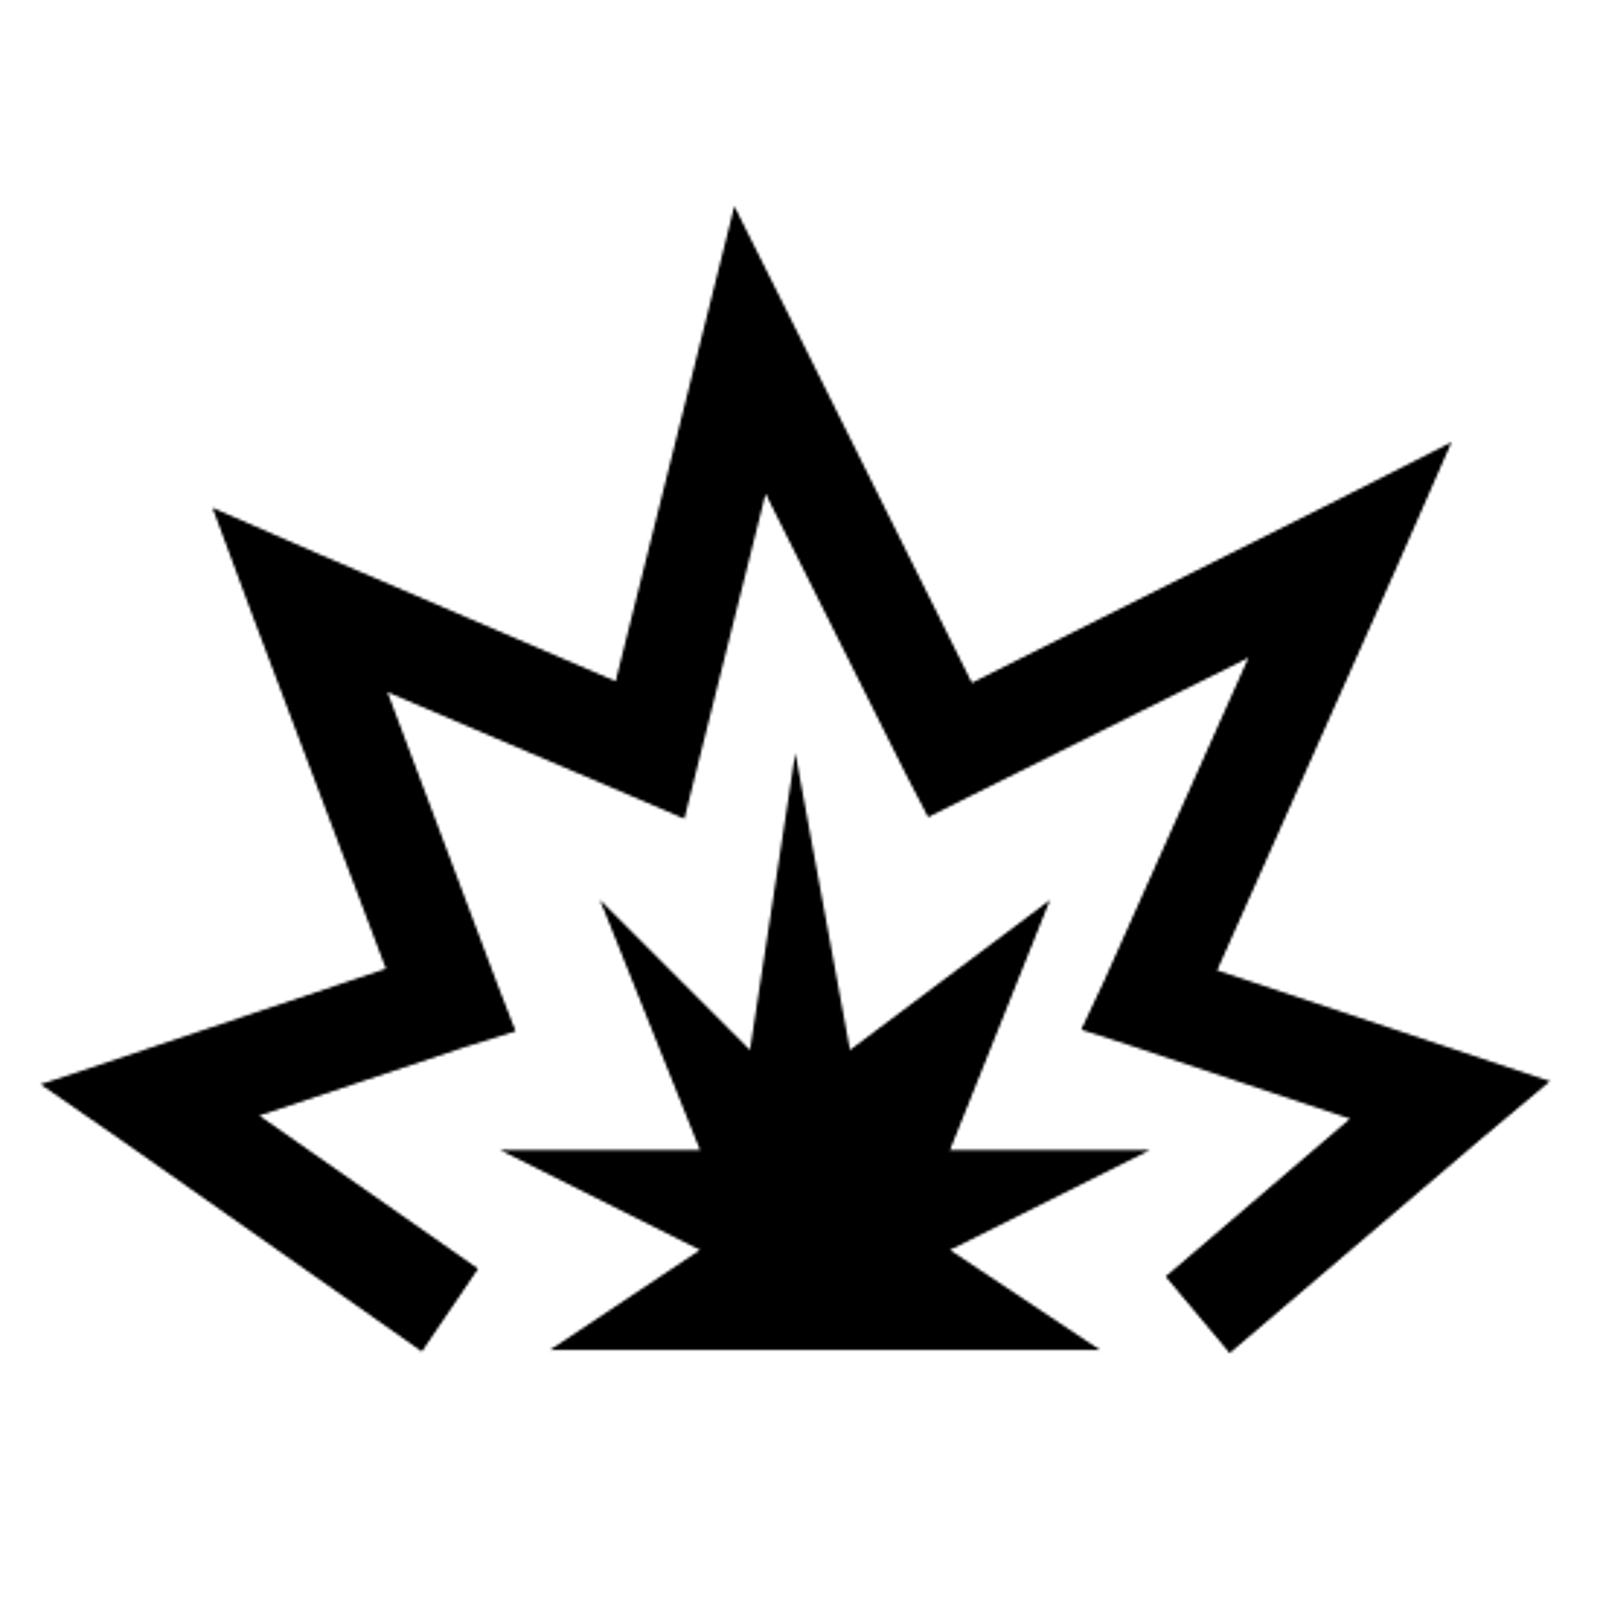 Взрыв icon